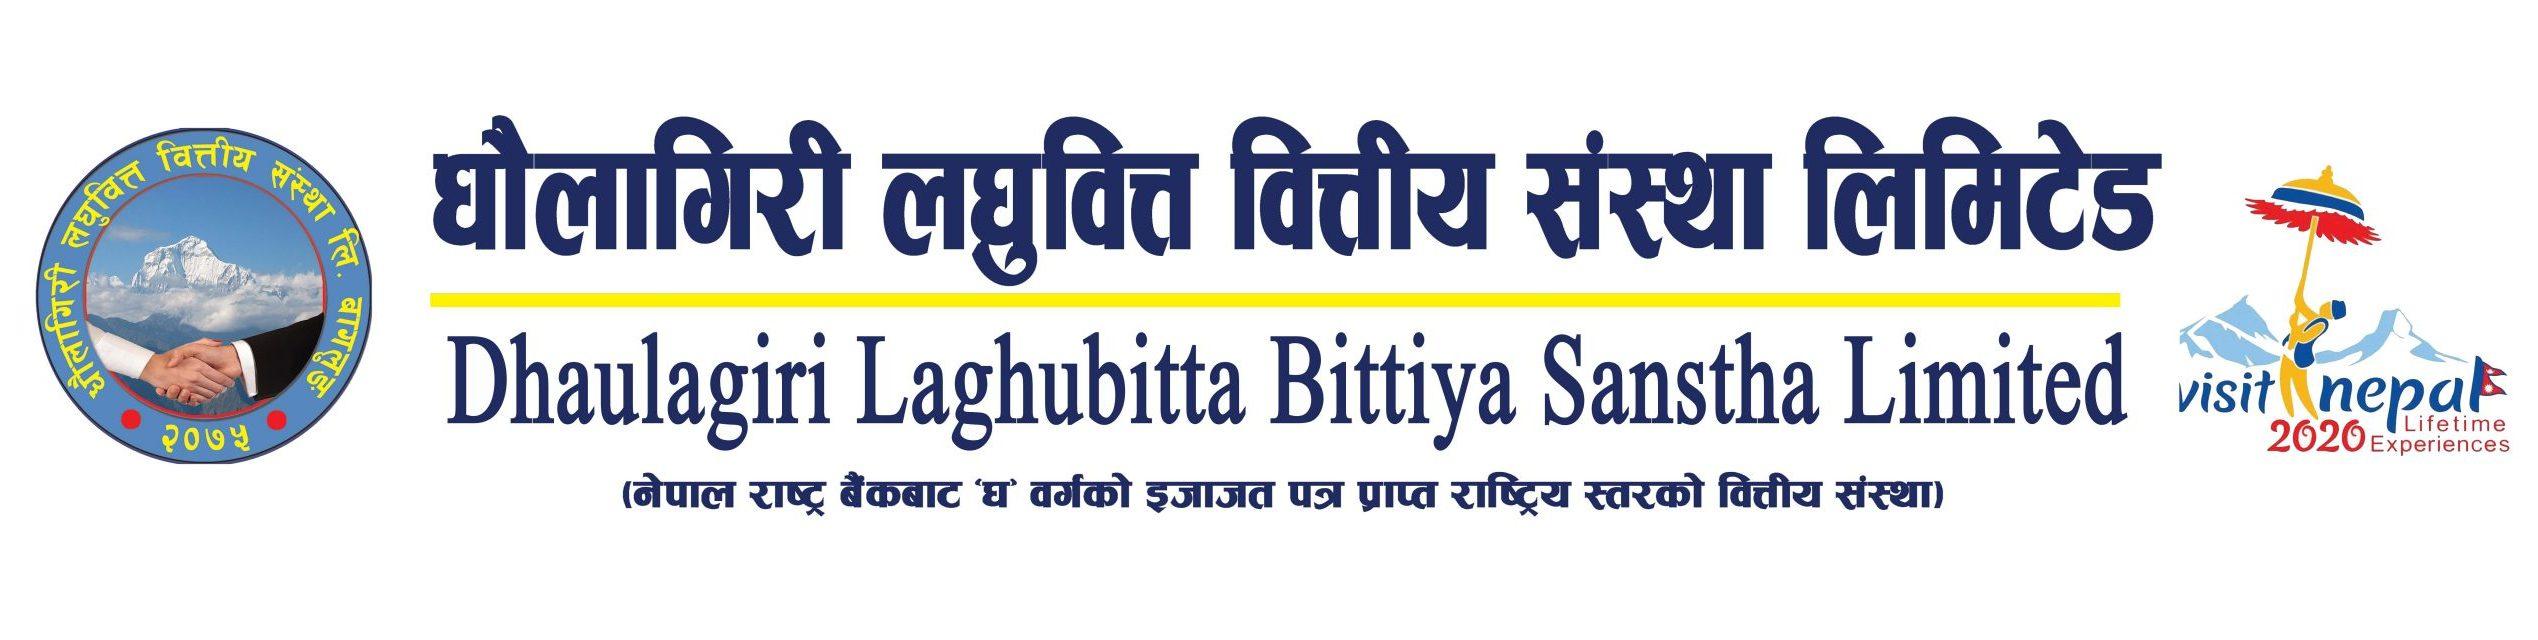 Dhaulagiri Laghubitta Bittiya Sanstha Limited